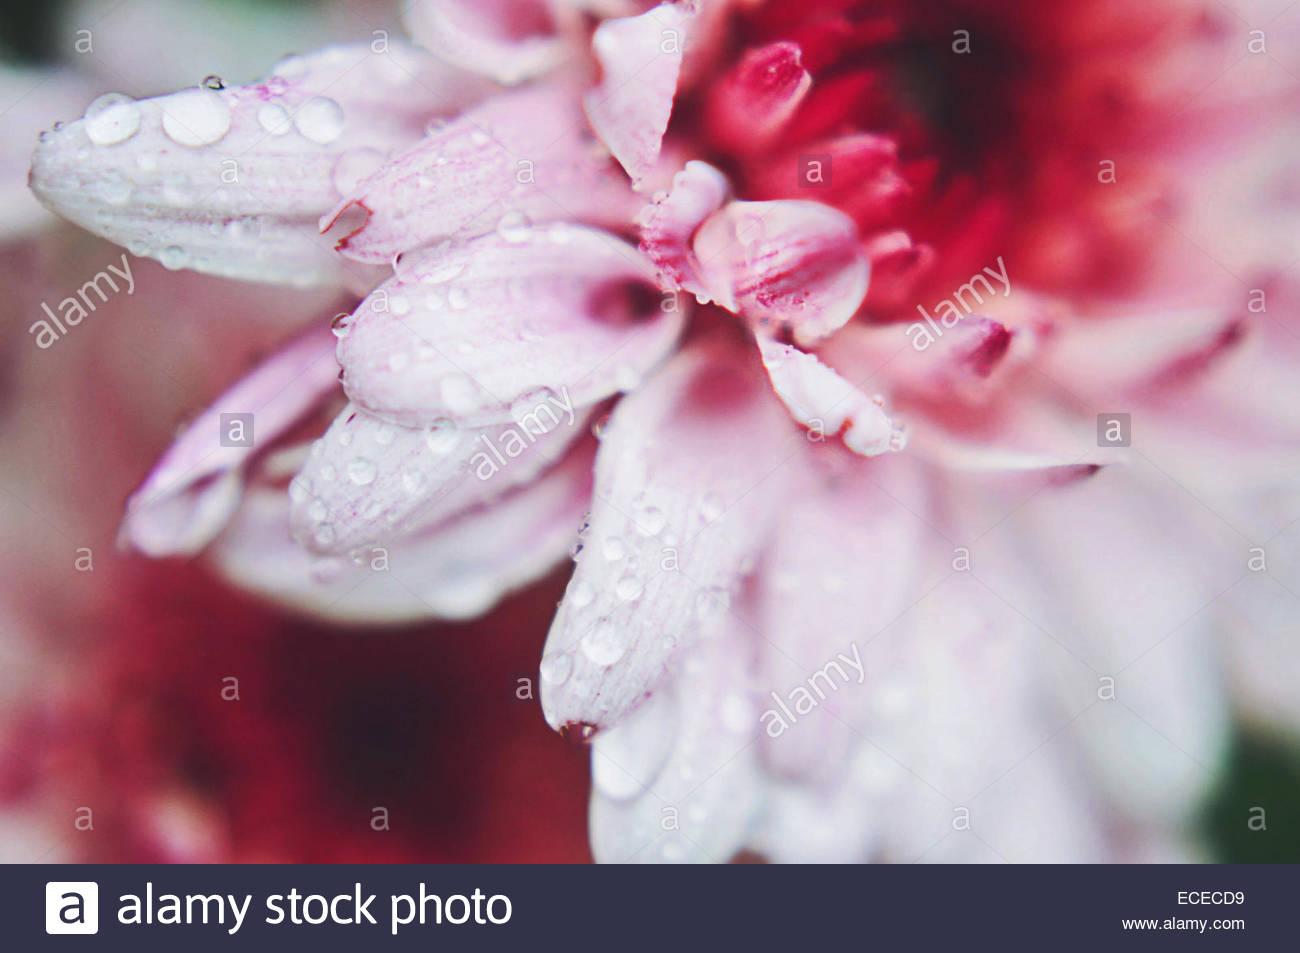 Makro rosa Chrysantheme Blume mit Wassertropfen Stockbild